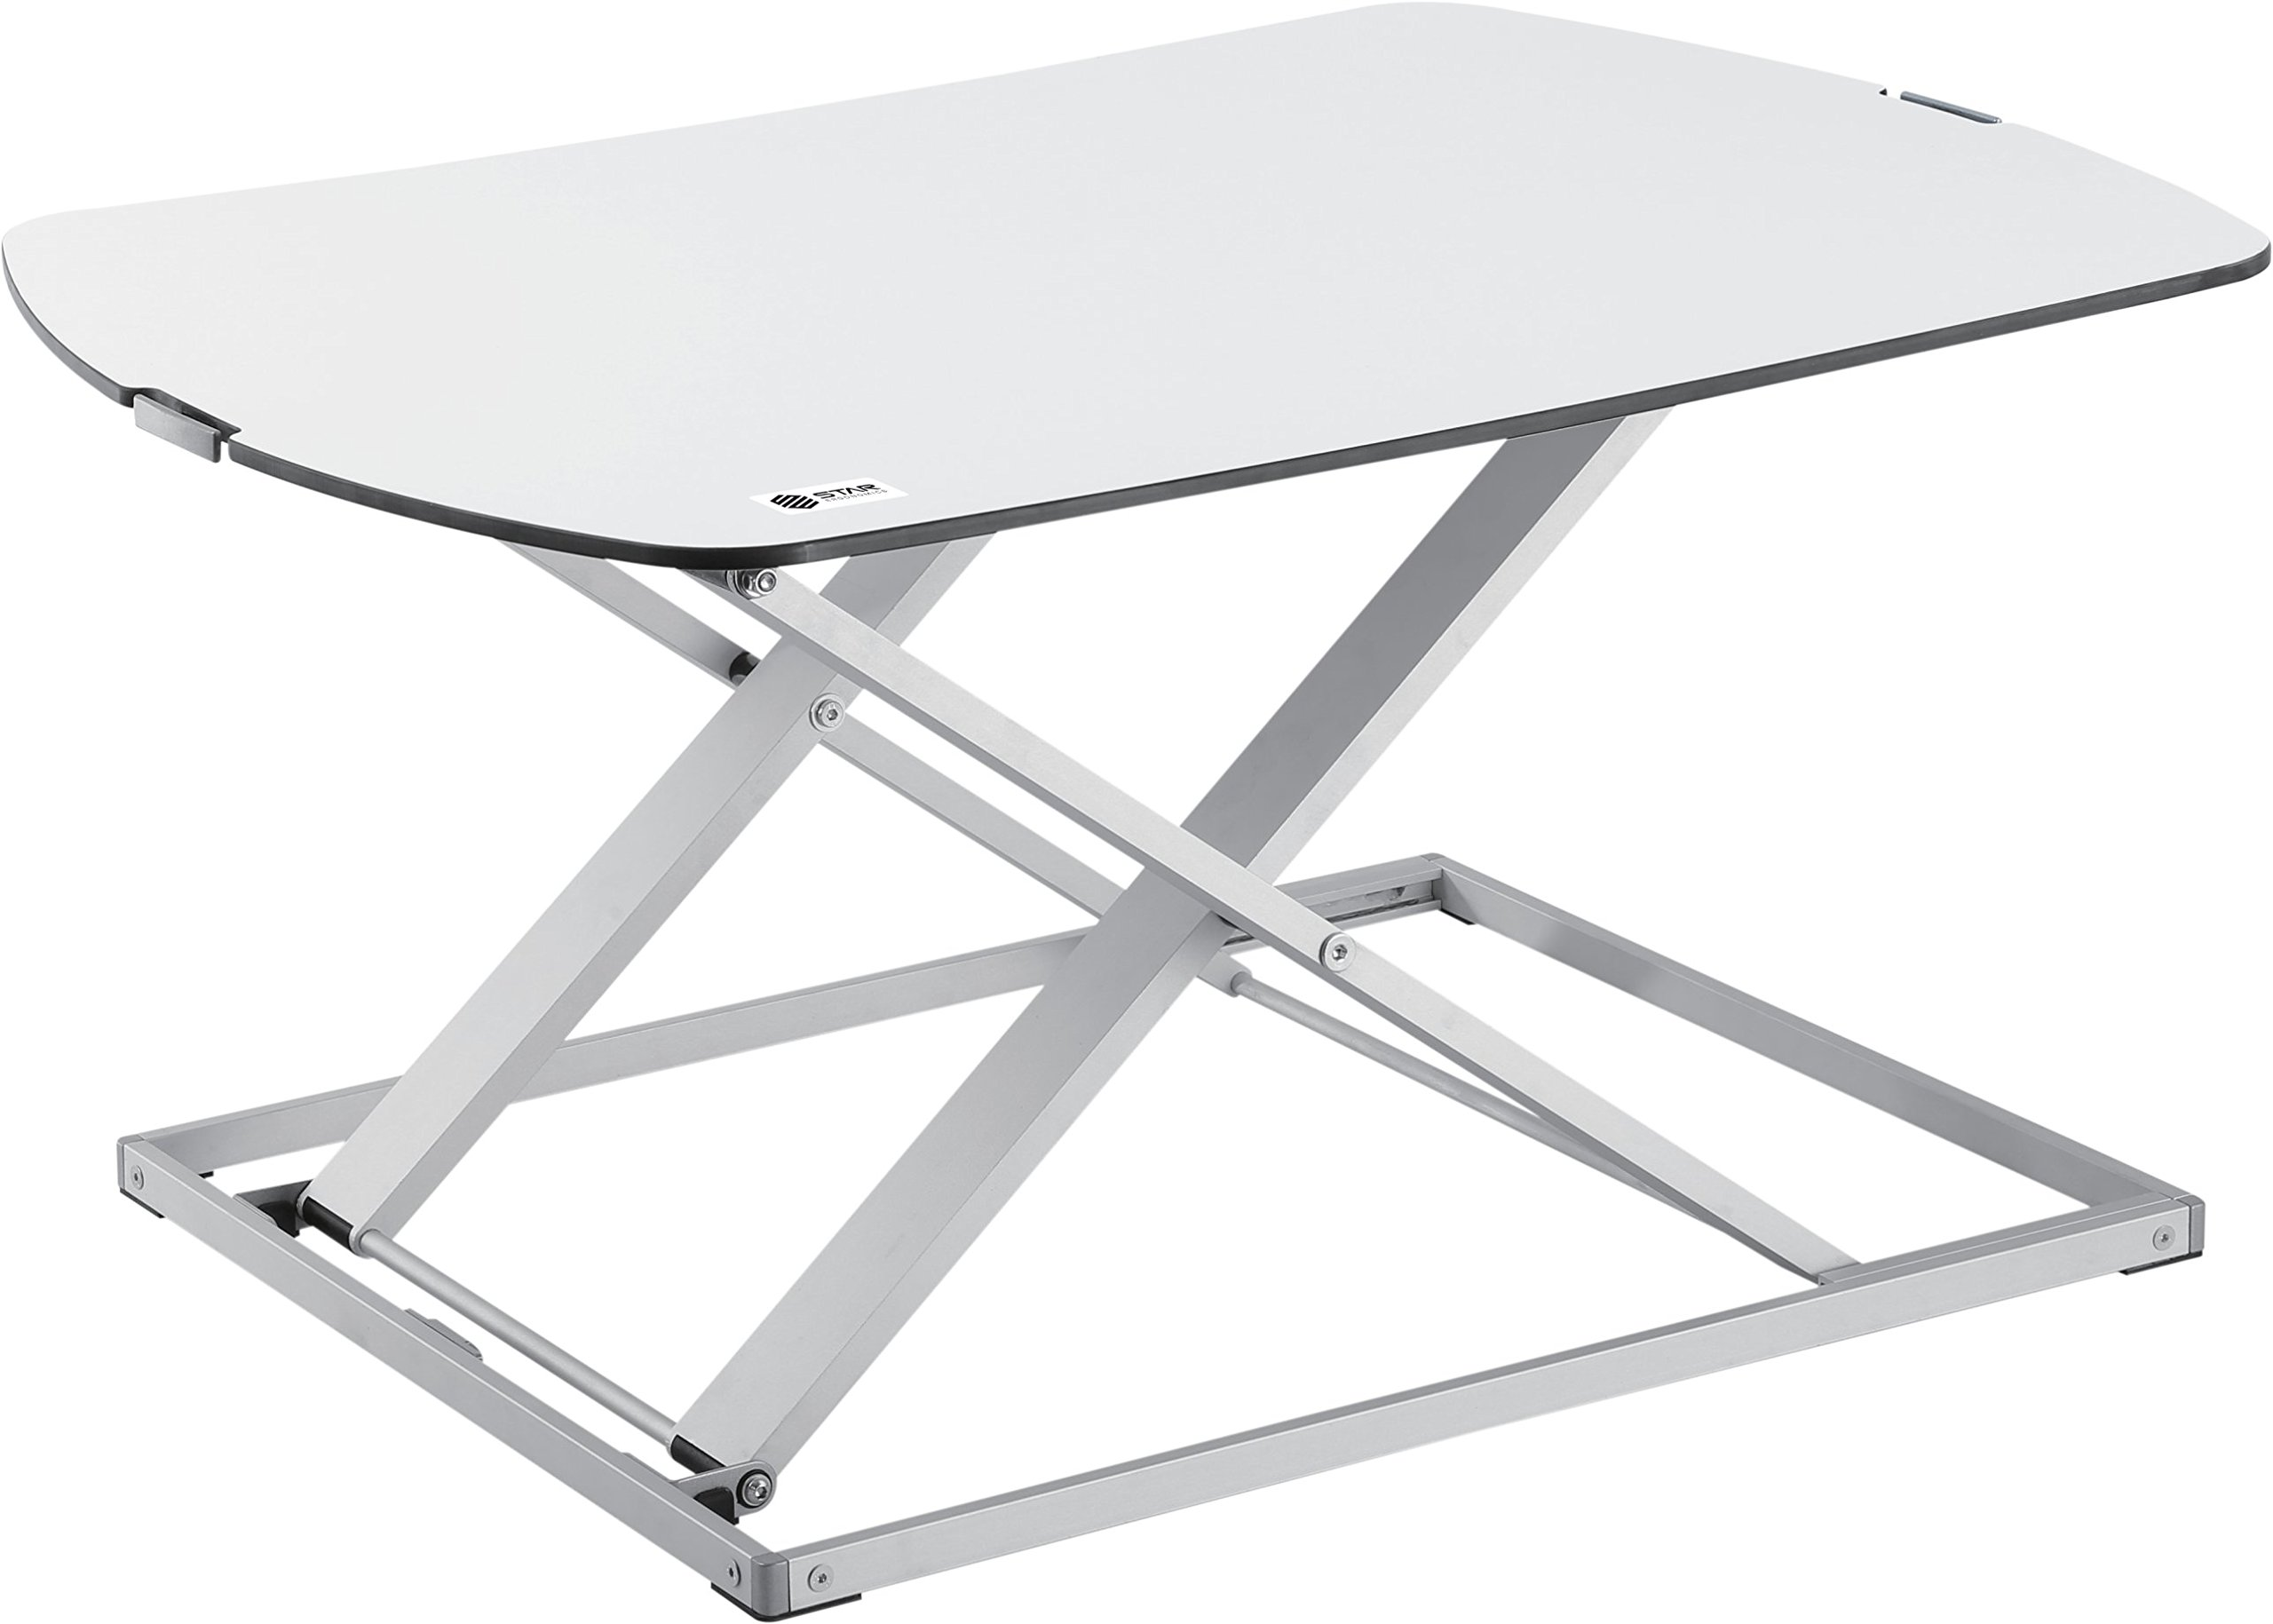 Star Ergonomics Ultra Slim Compact Standing Desk, White (SE03M1WW) by STAR ERGONOMICS